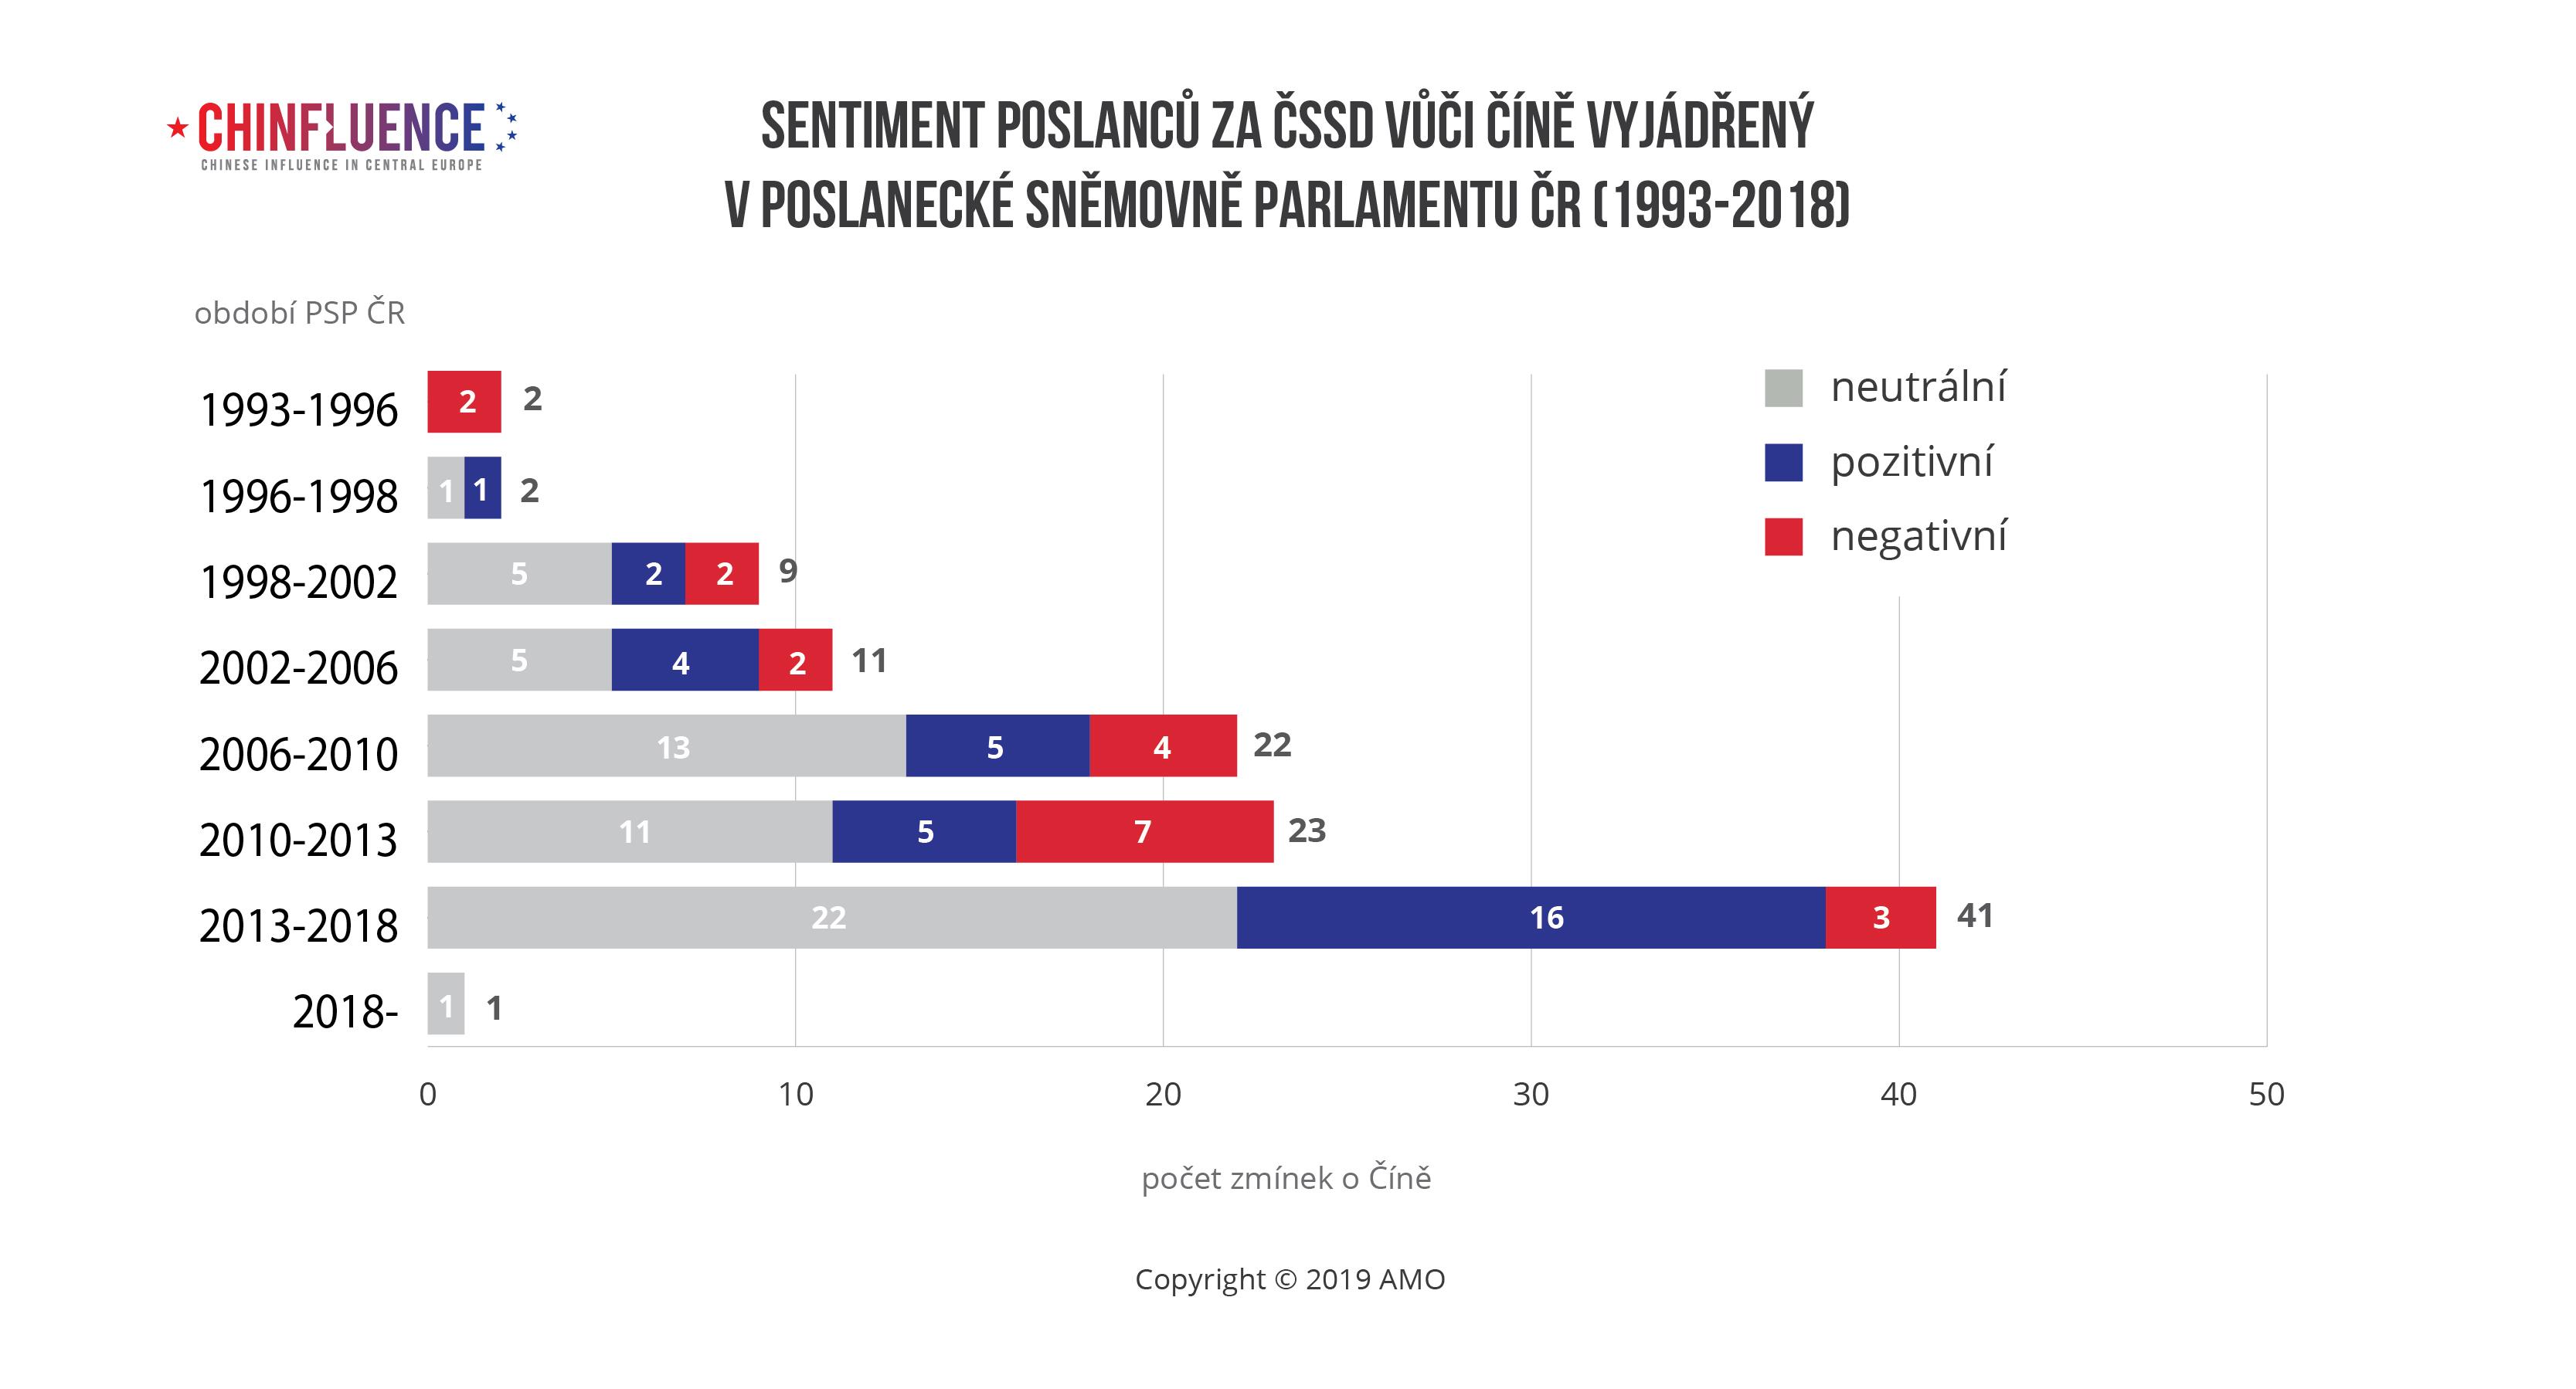 Sentiment poslancu za CSSD vuci Cine vyjadreny v Poslanecke snemovne Parlamentu CR-1993-2018-